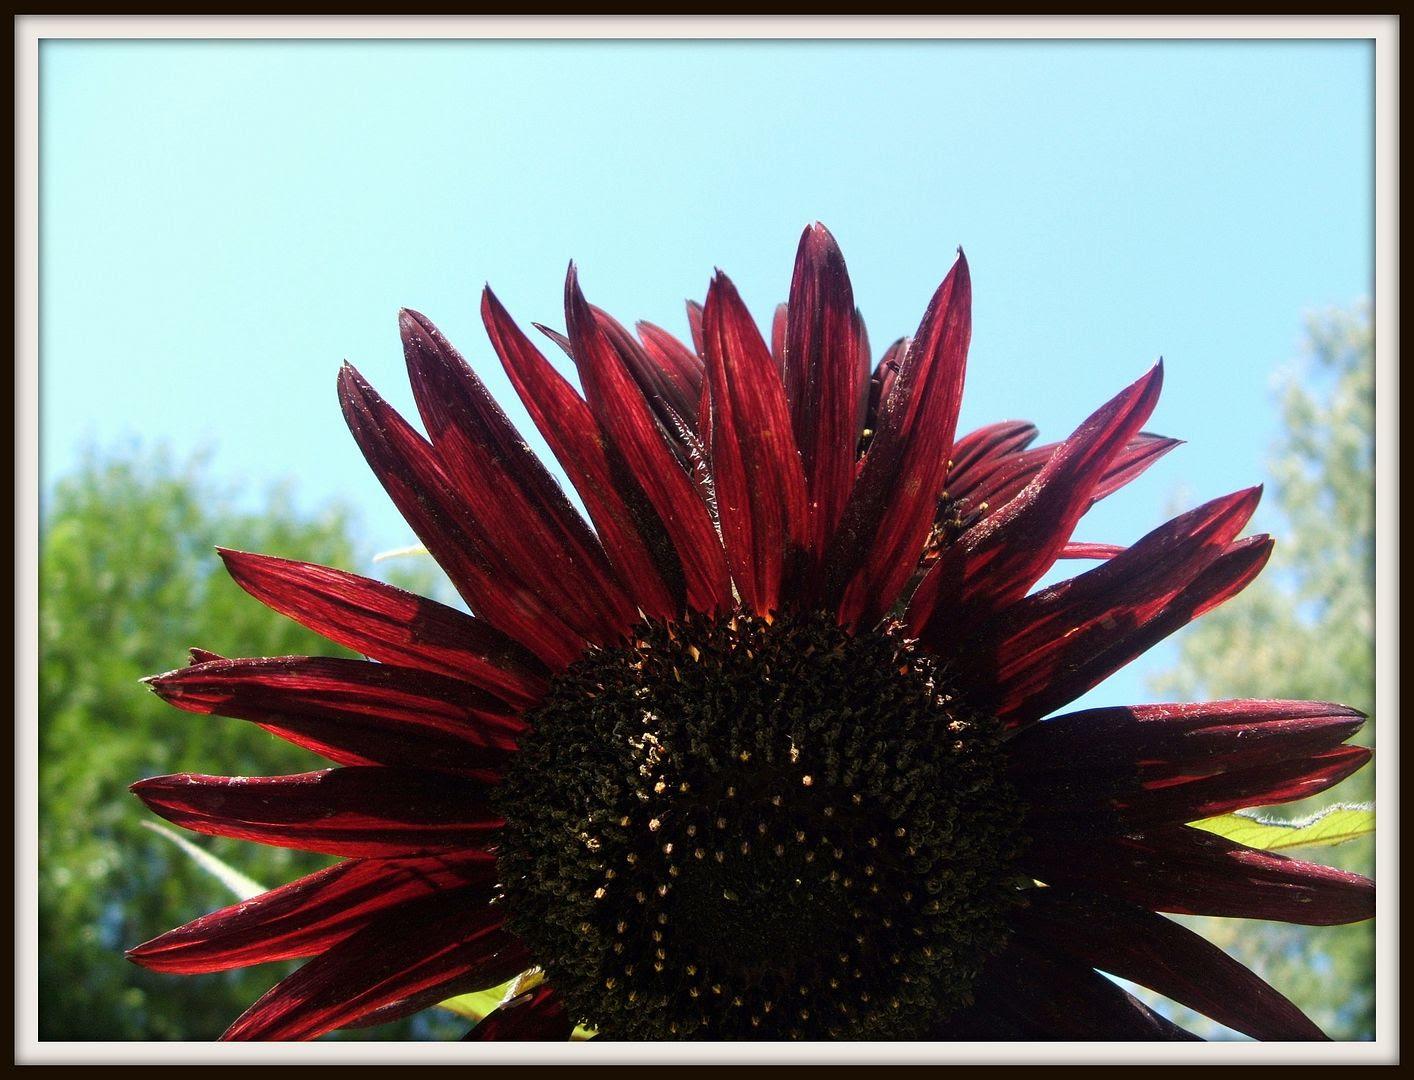 Prado Sunflowers by Angie Ouellette-Tower for godsgrowinggarden.com photo 011_zpsa0fa8cc3.jpg